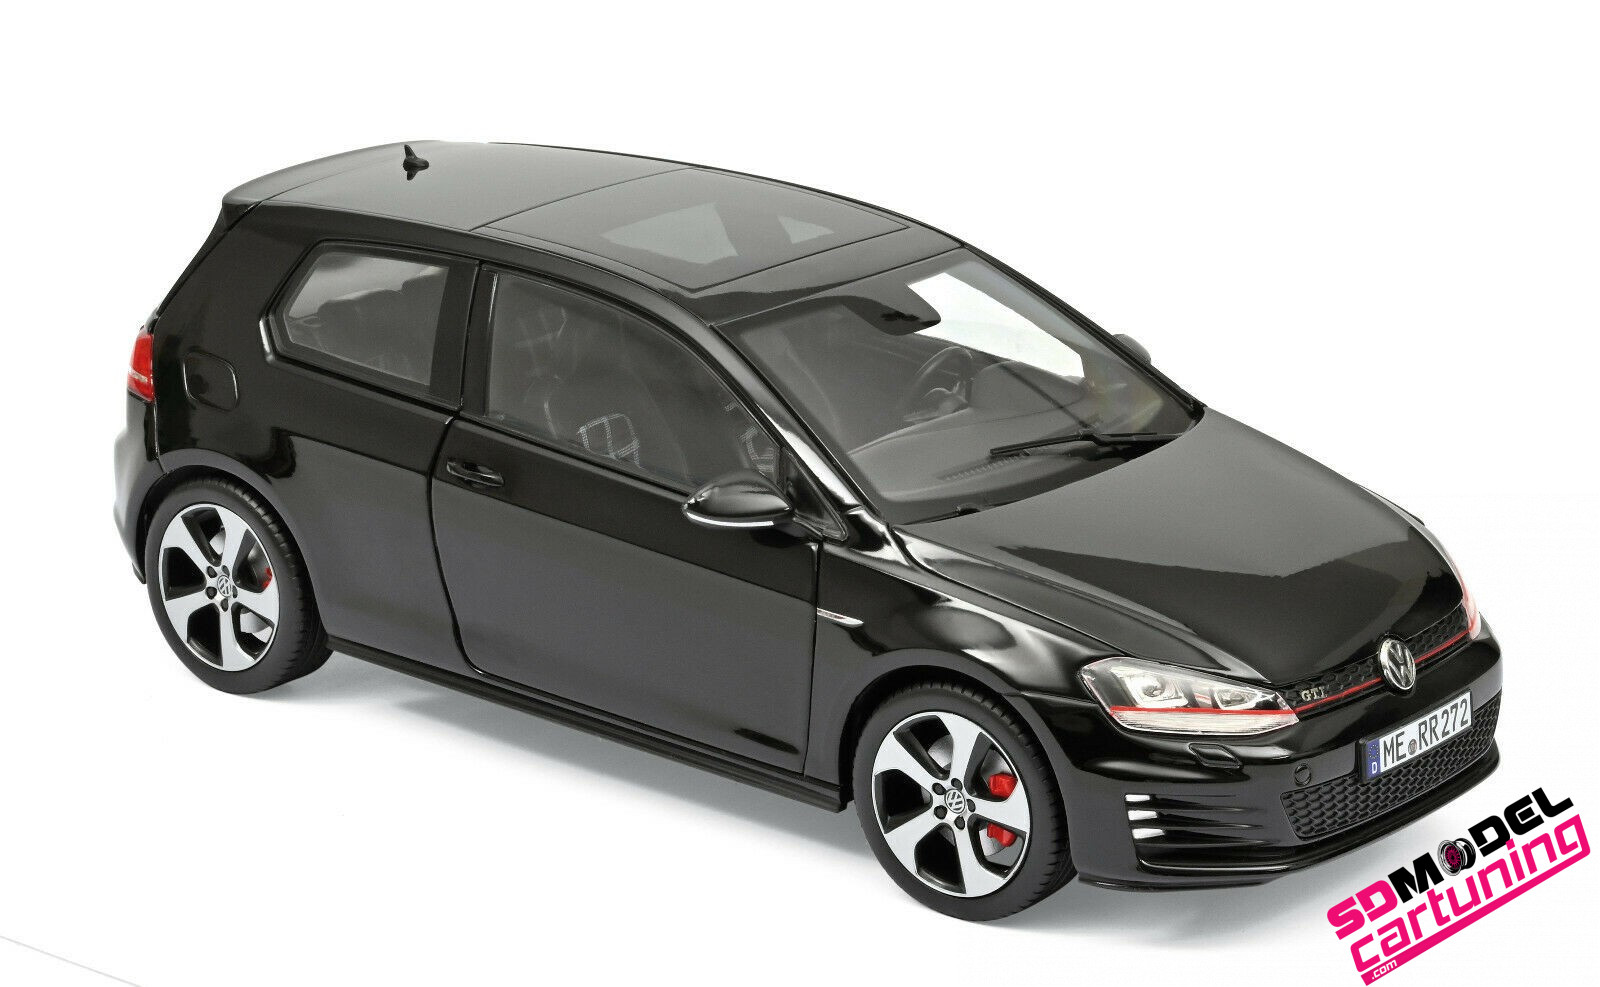 1:18 Volkswagen Golf GTI 2013